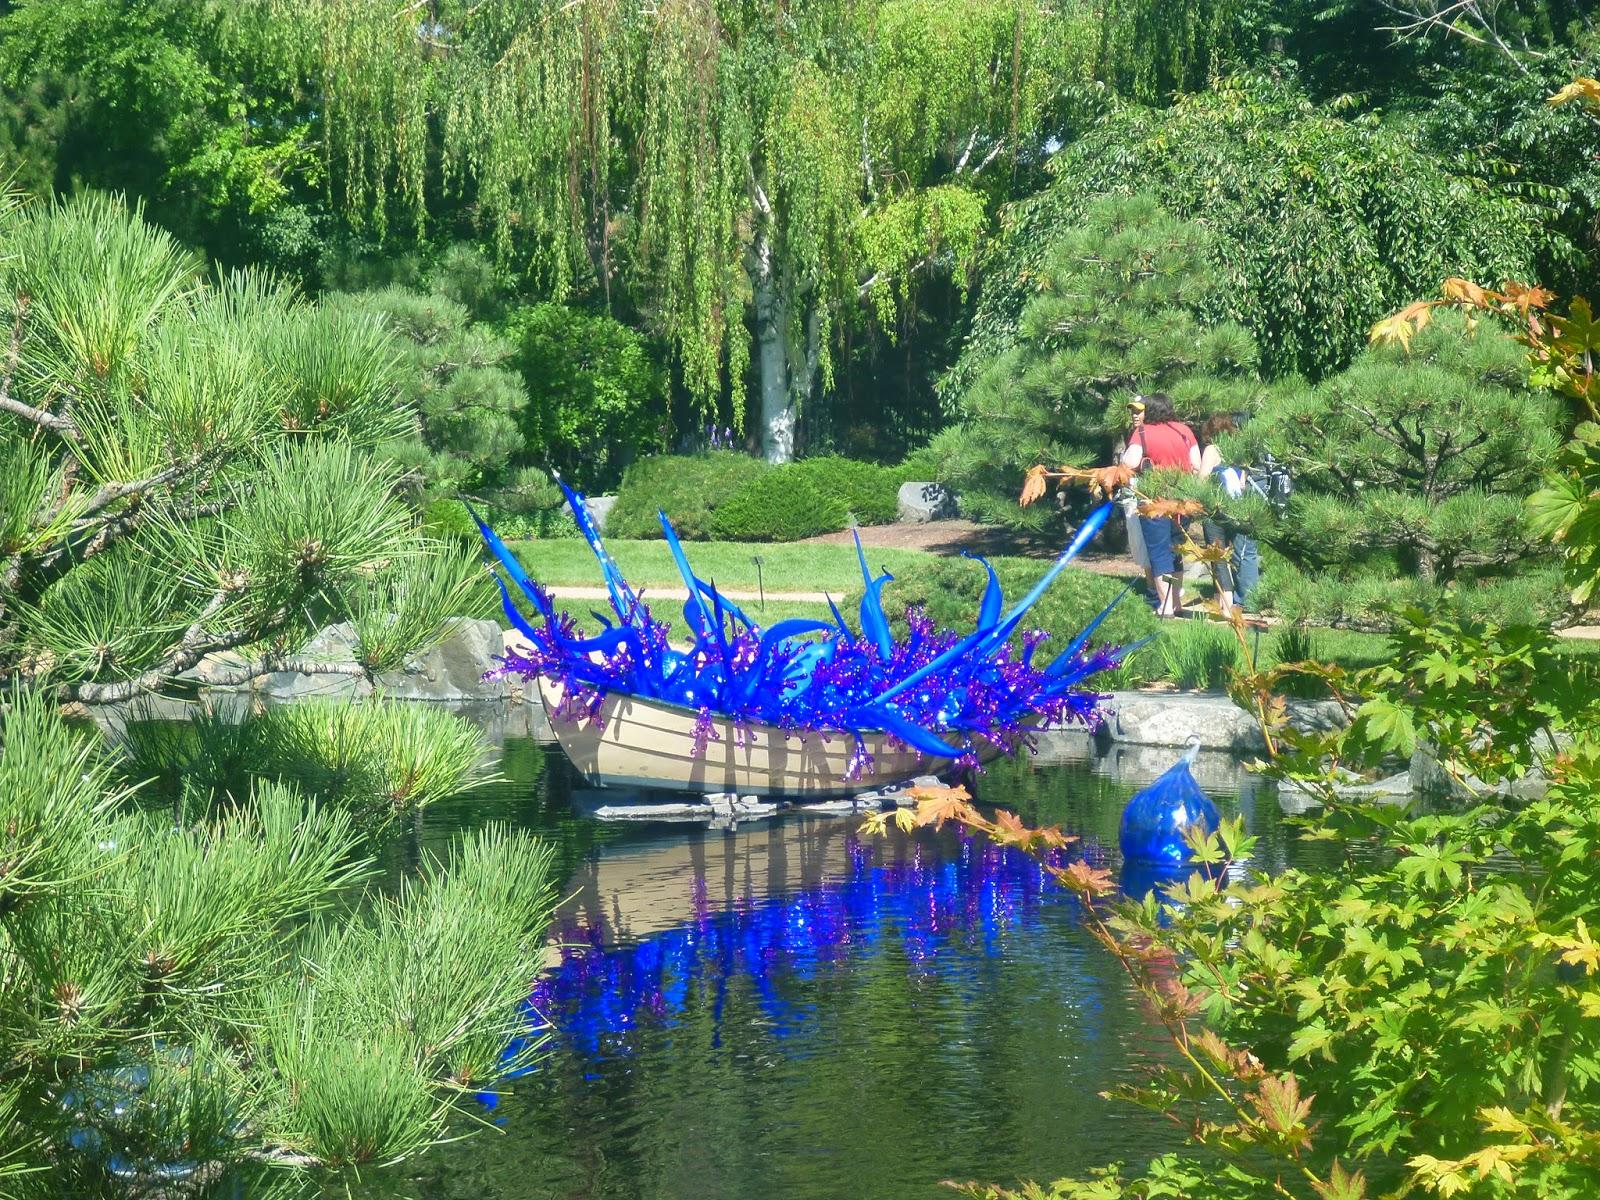 Artistic Journeys Chihuly Exhibit At The Denver Botanic